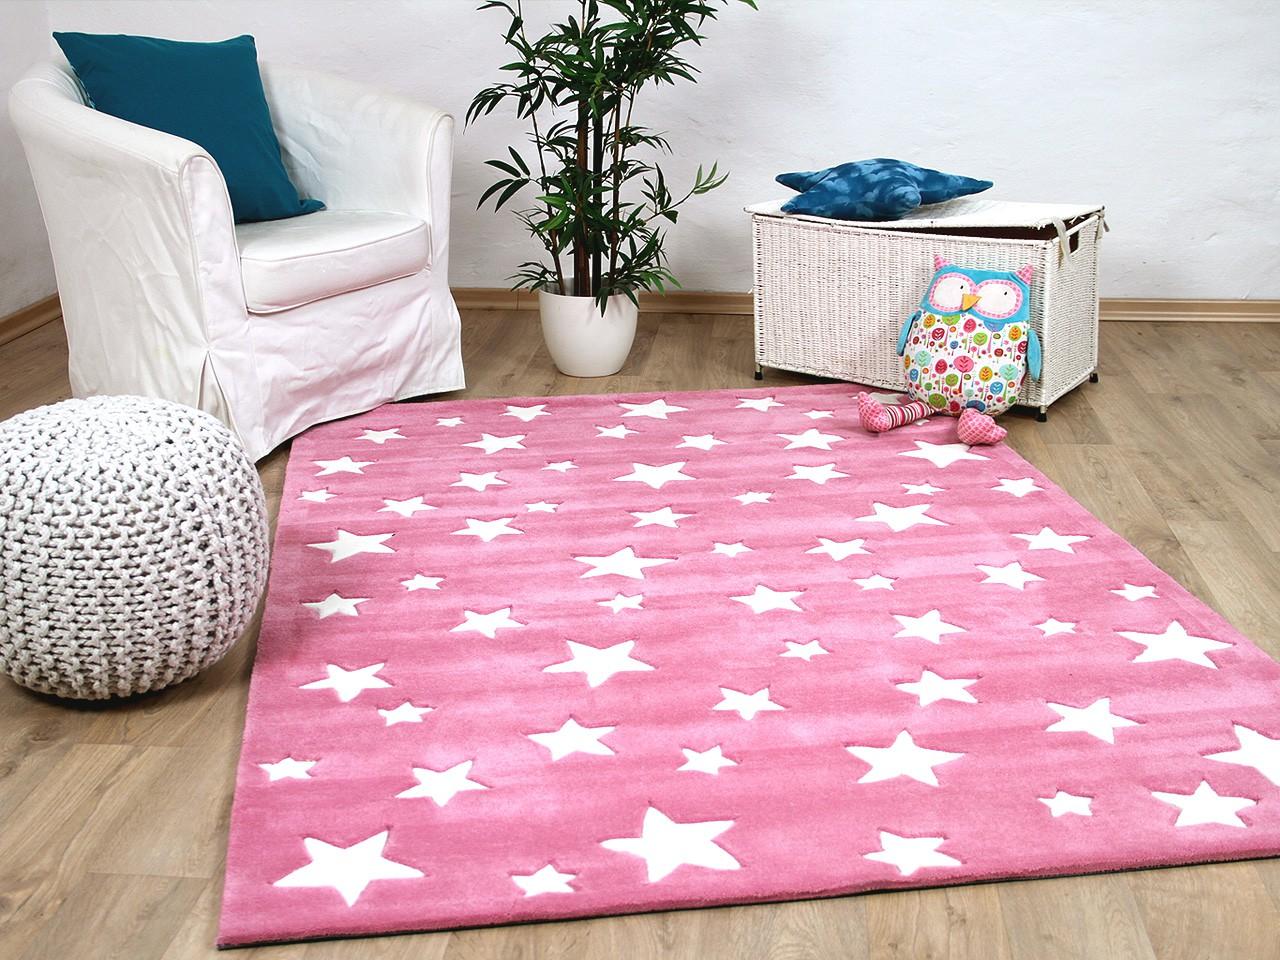 Kinderteppich sterne rosa  Lifestyle Kinderteppich Sterne Rosa Teppiche Kinder- und ...